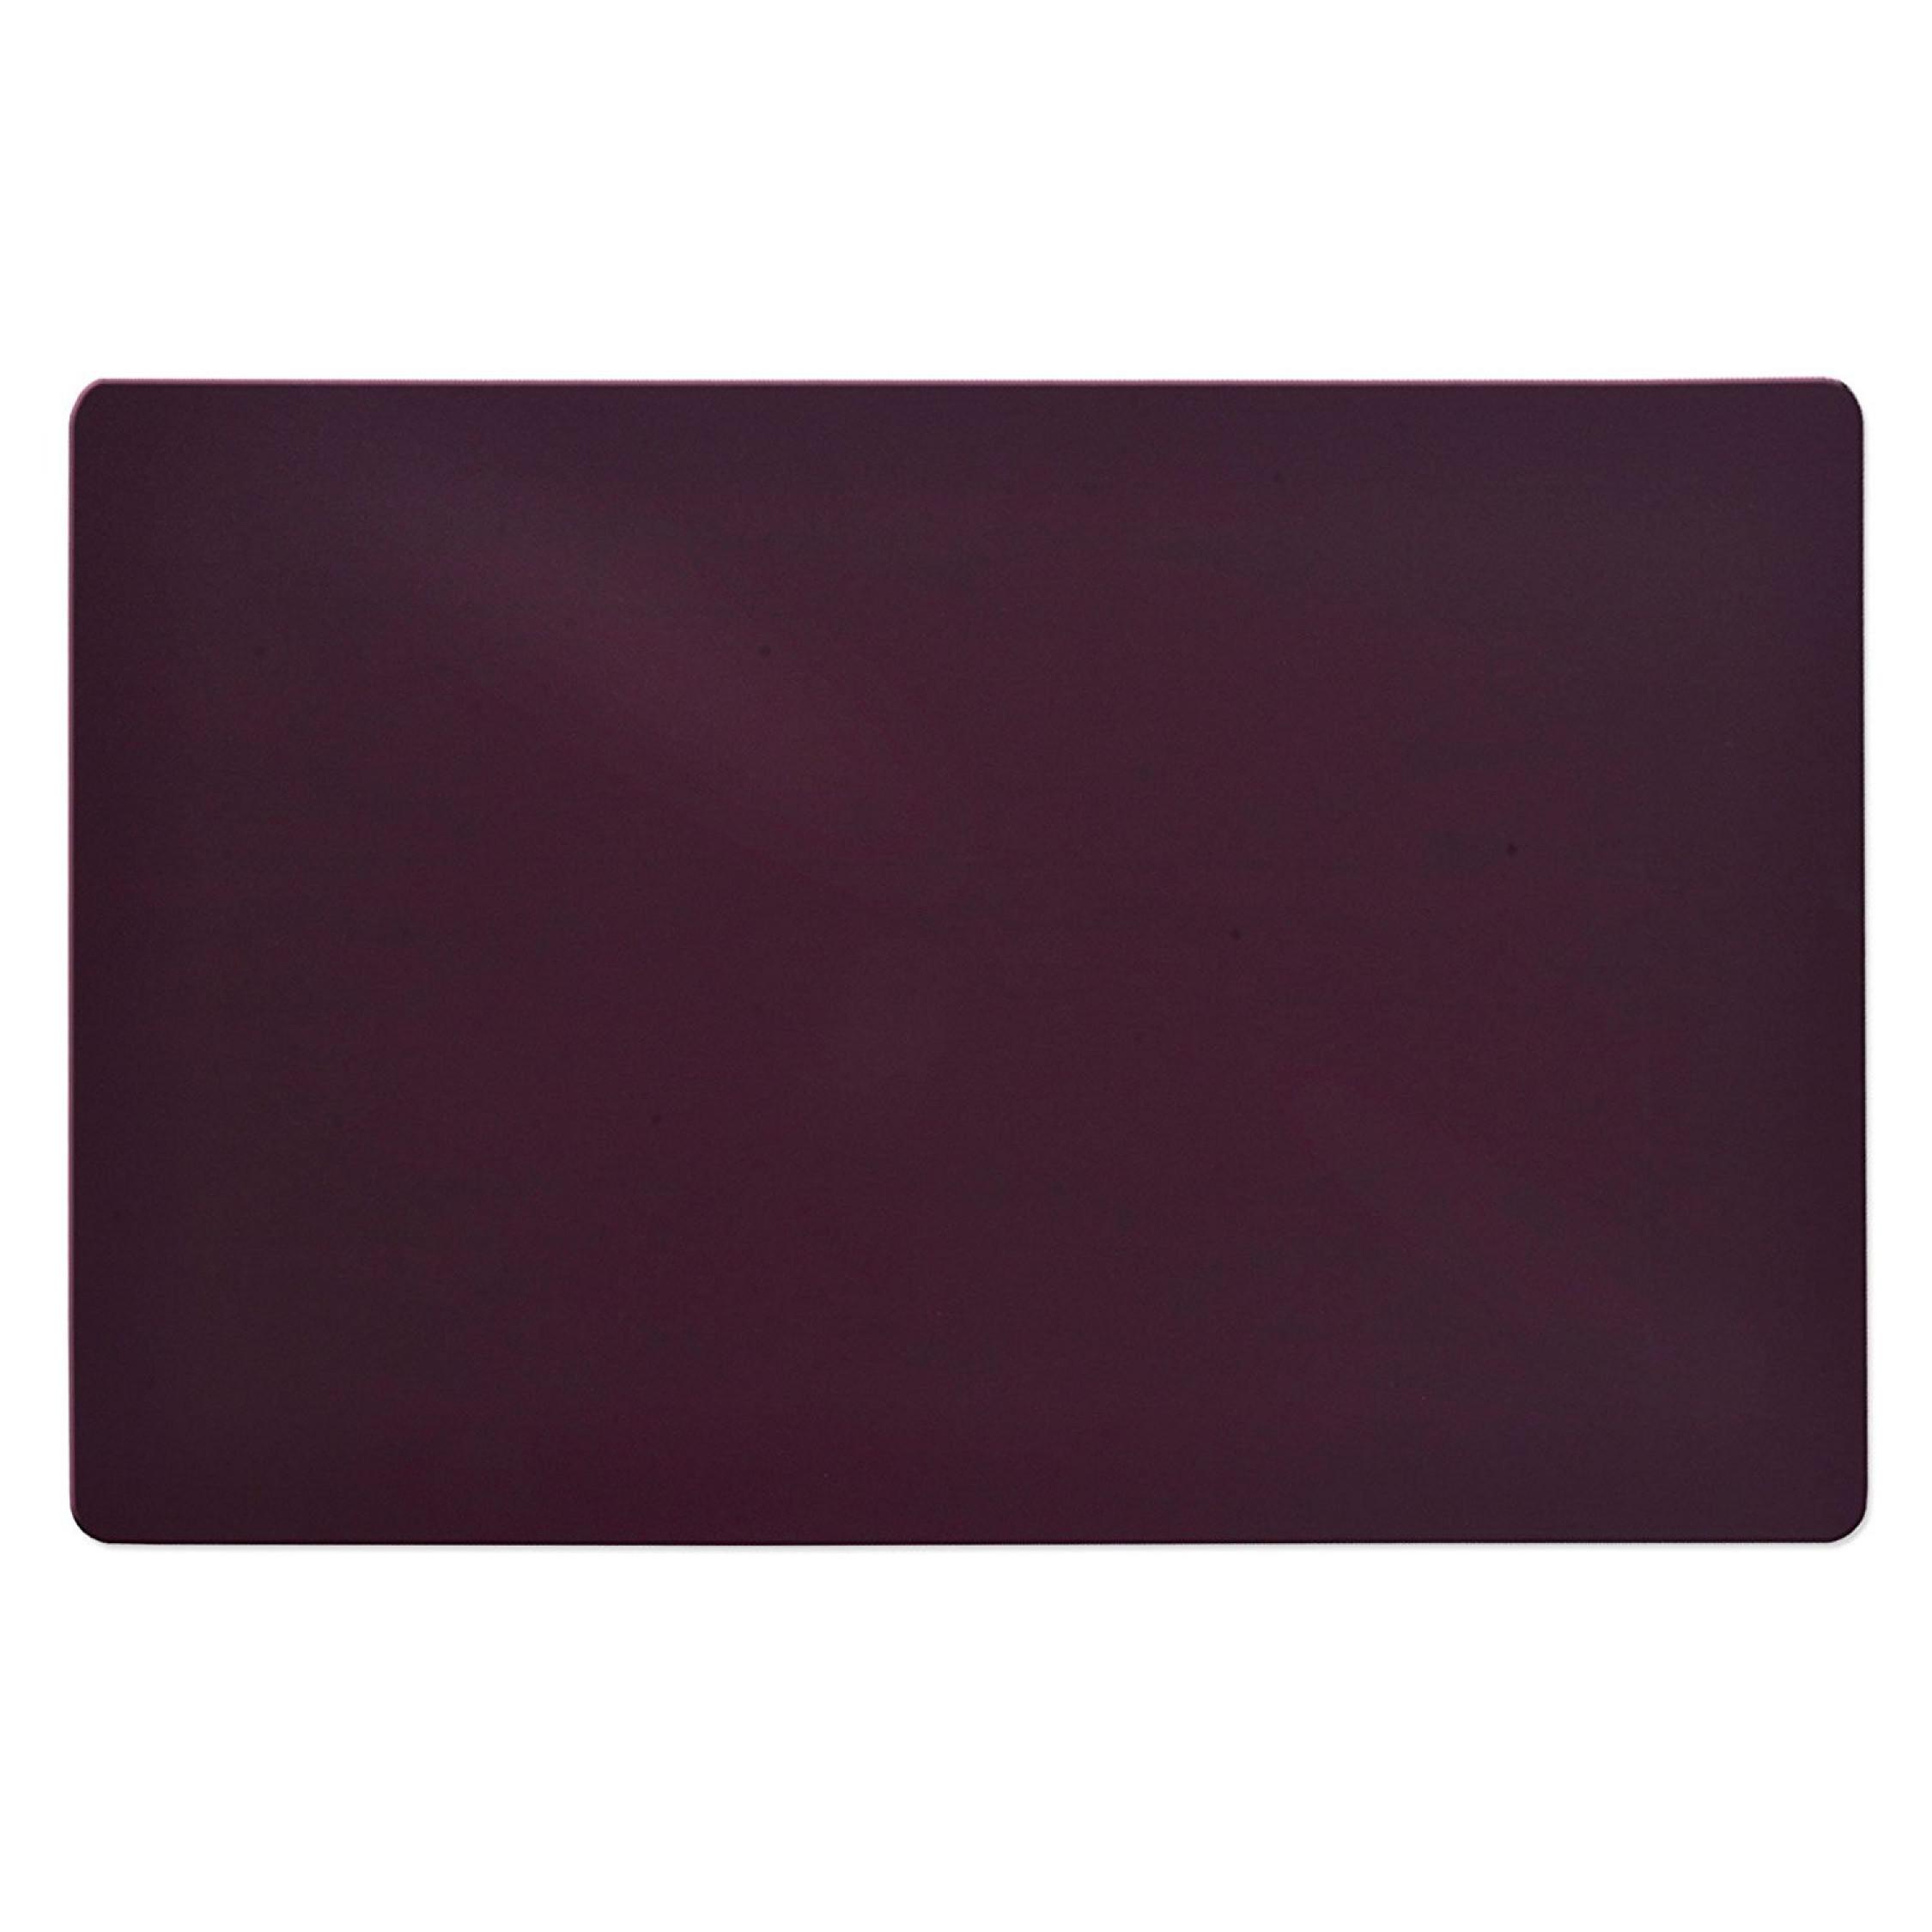 Rectangular Office Chair Mat Purple Hard Floor Protection